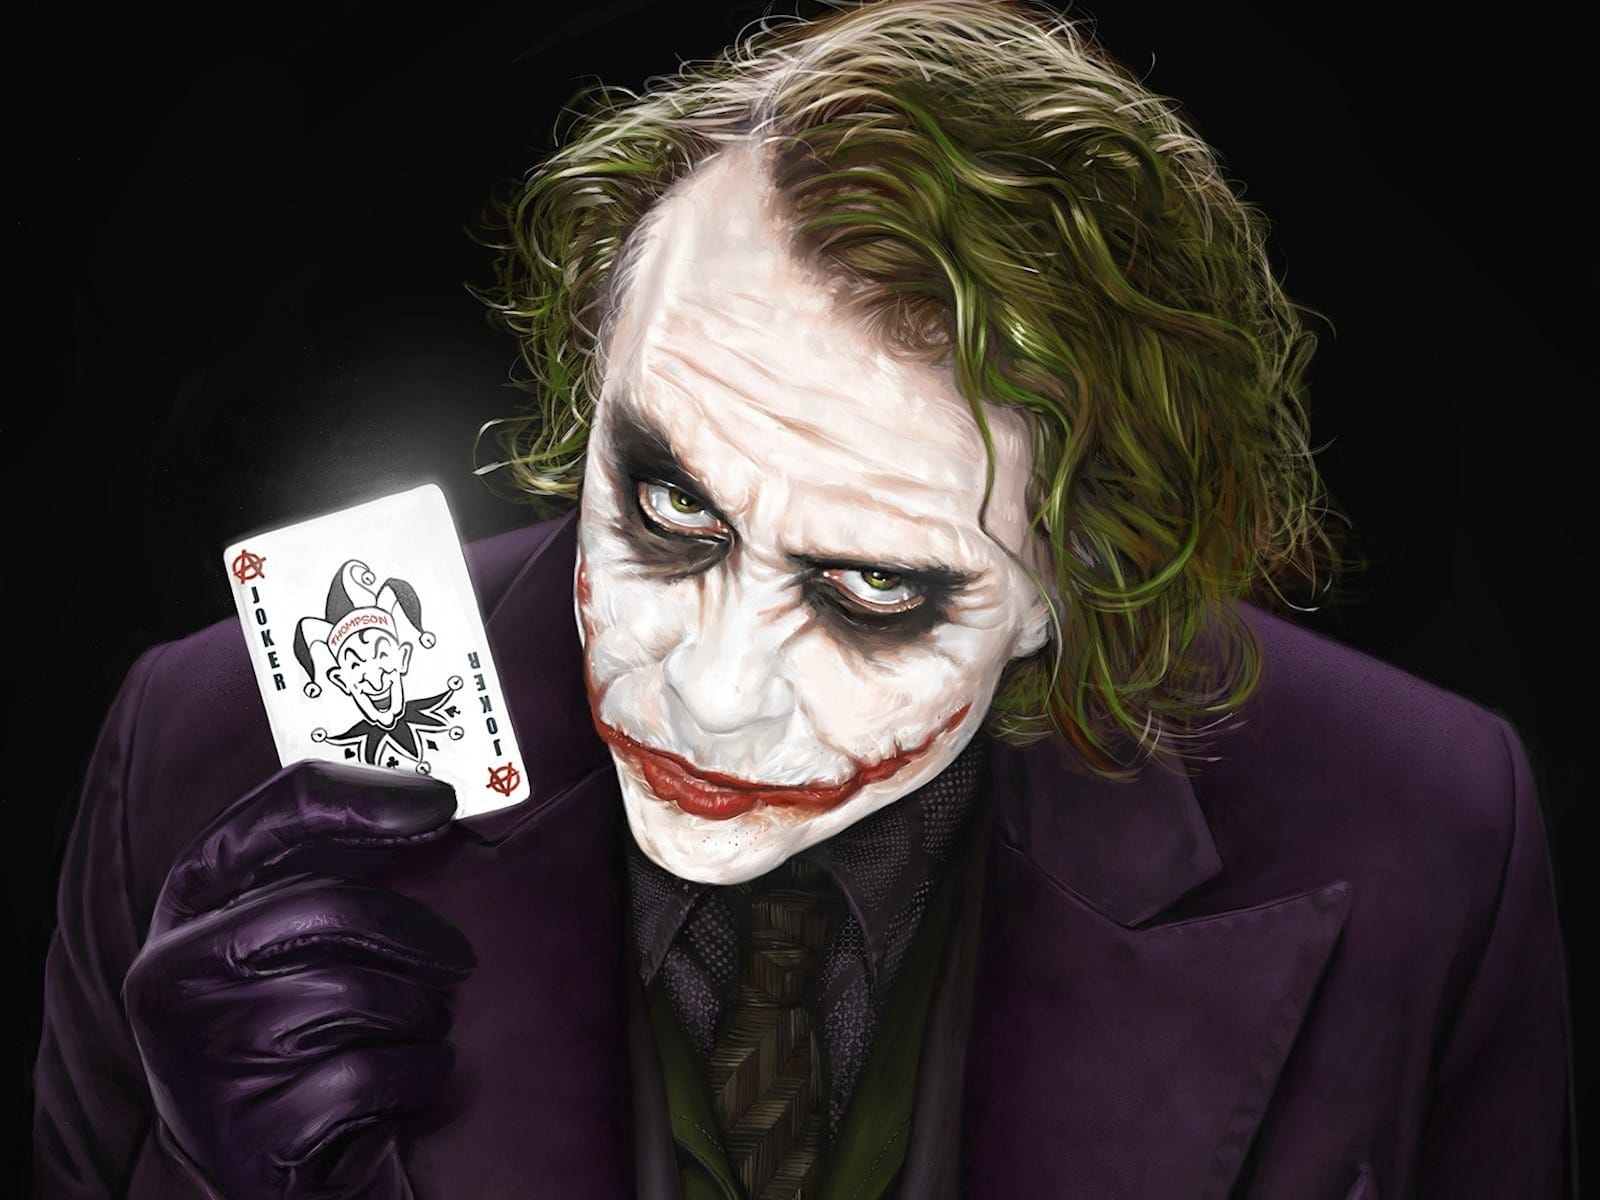 cliches-villanos-cine-joker-heath-ledger-joker